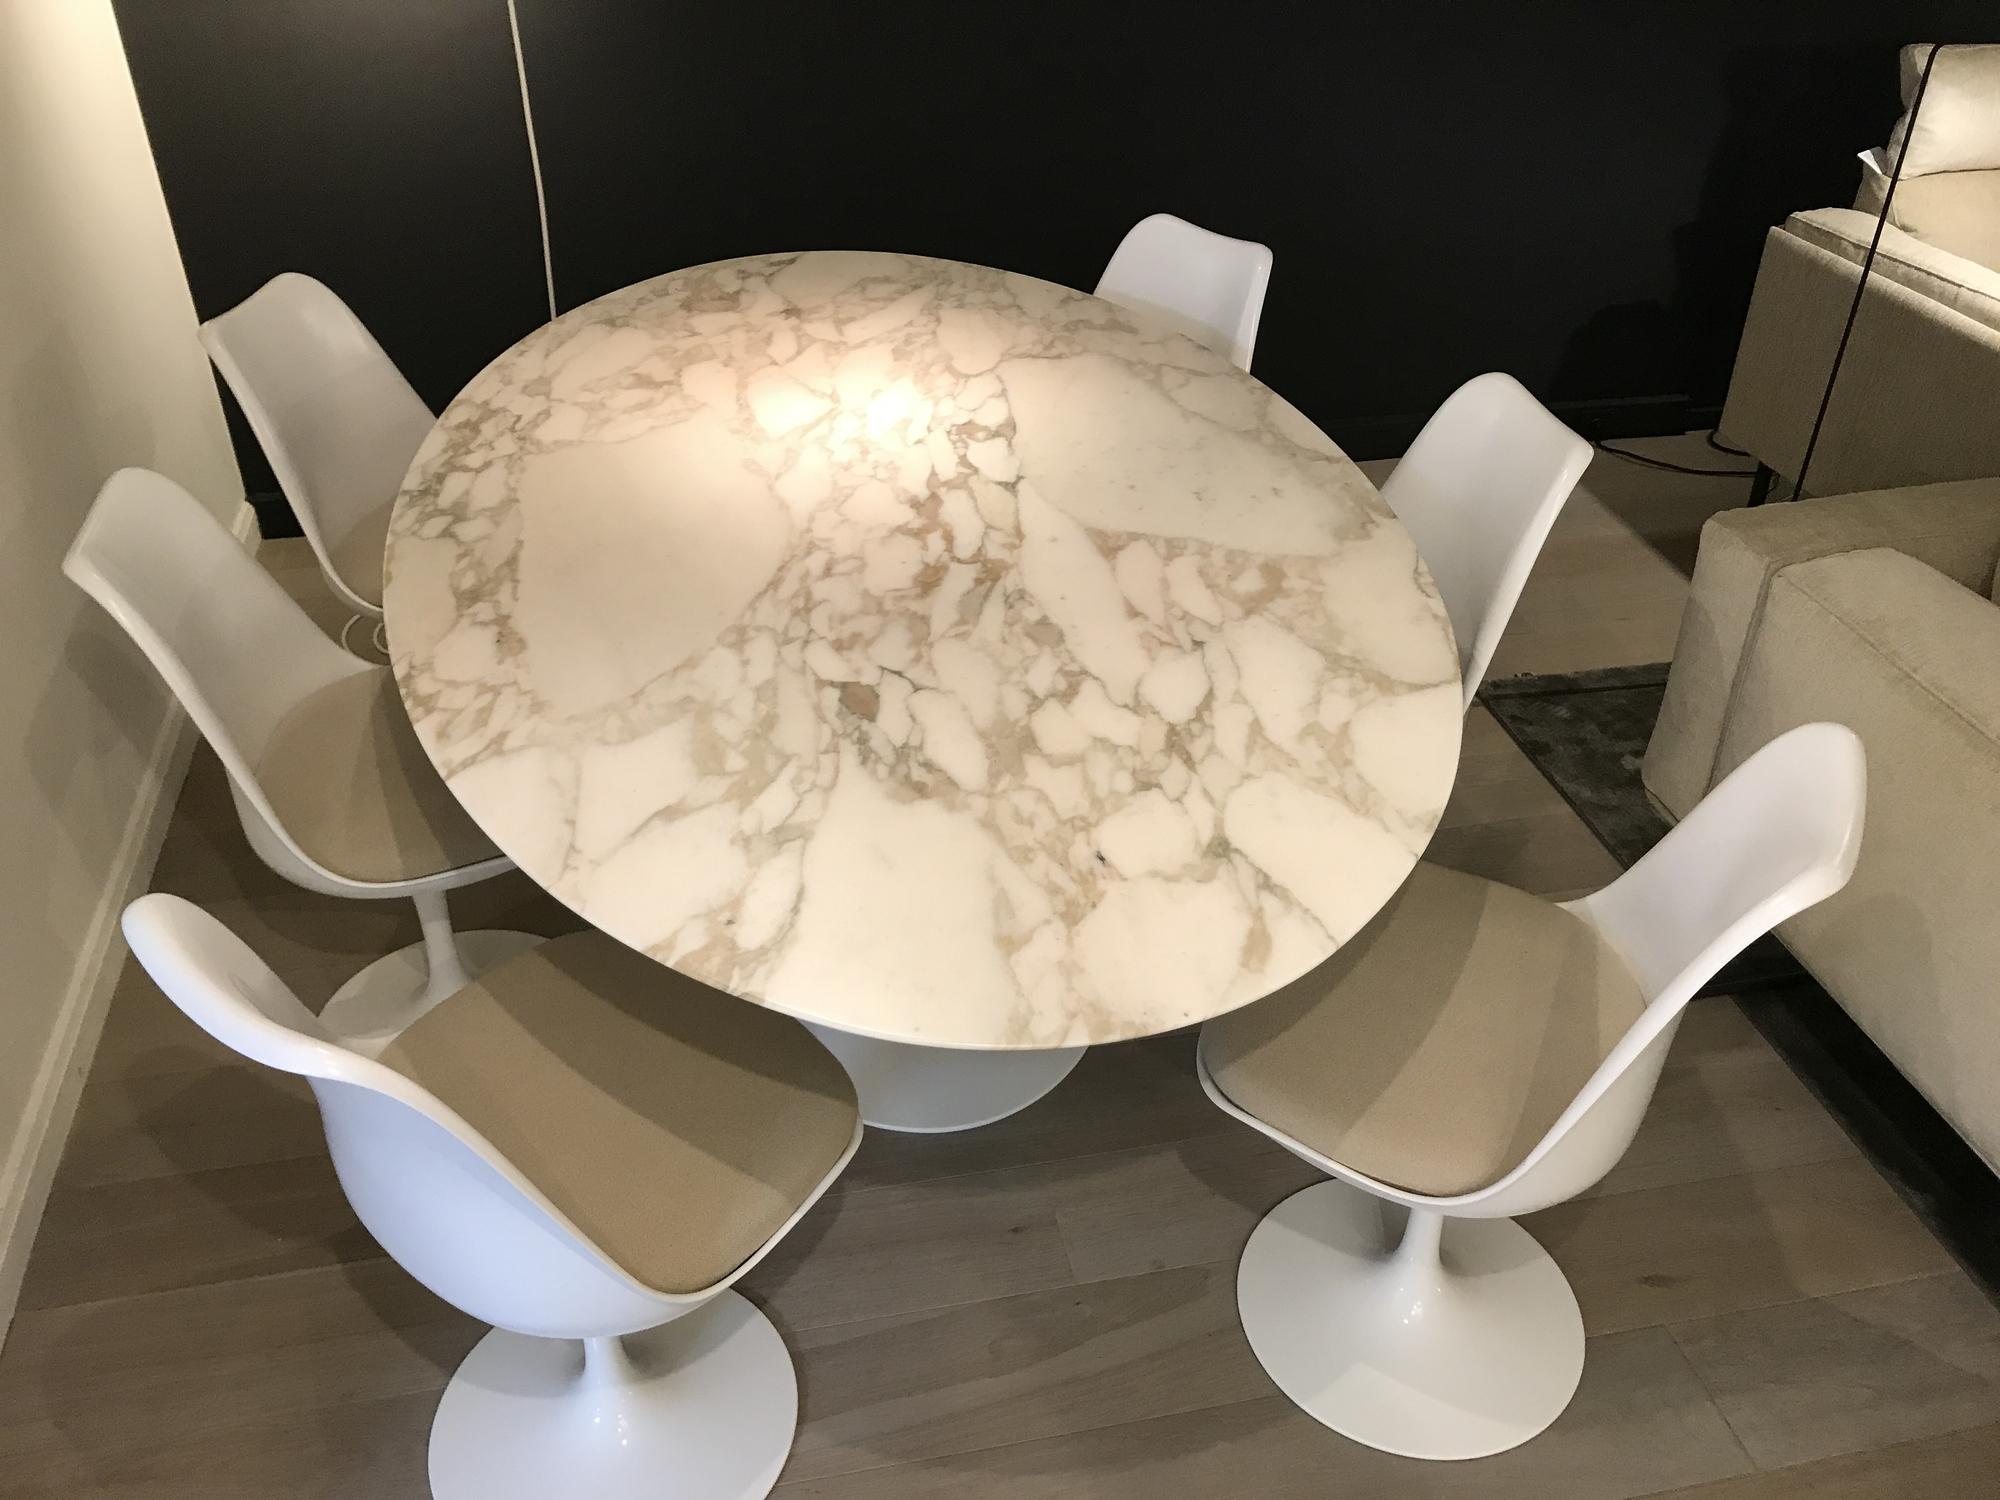 Saarinen Tafel Ovaal : Knoll saarinen tafel ovaal met tulip stoelen delmi decor